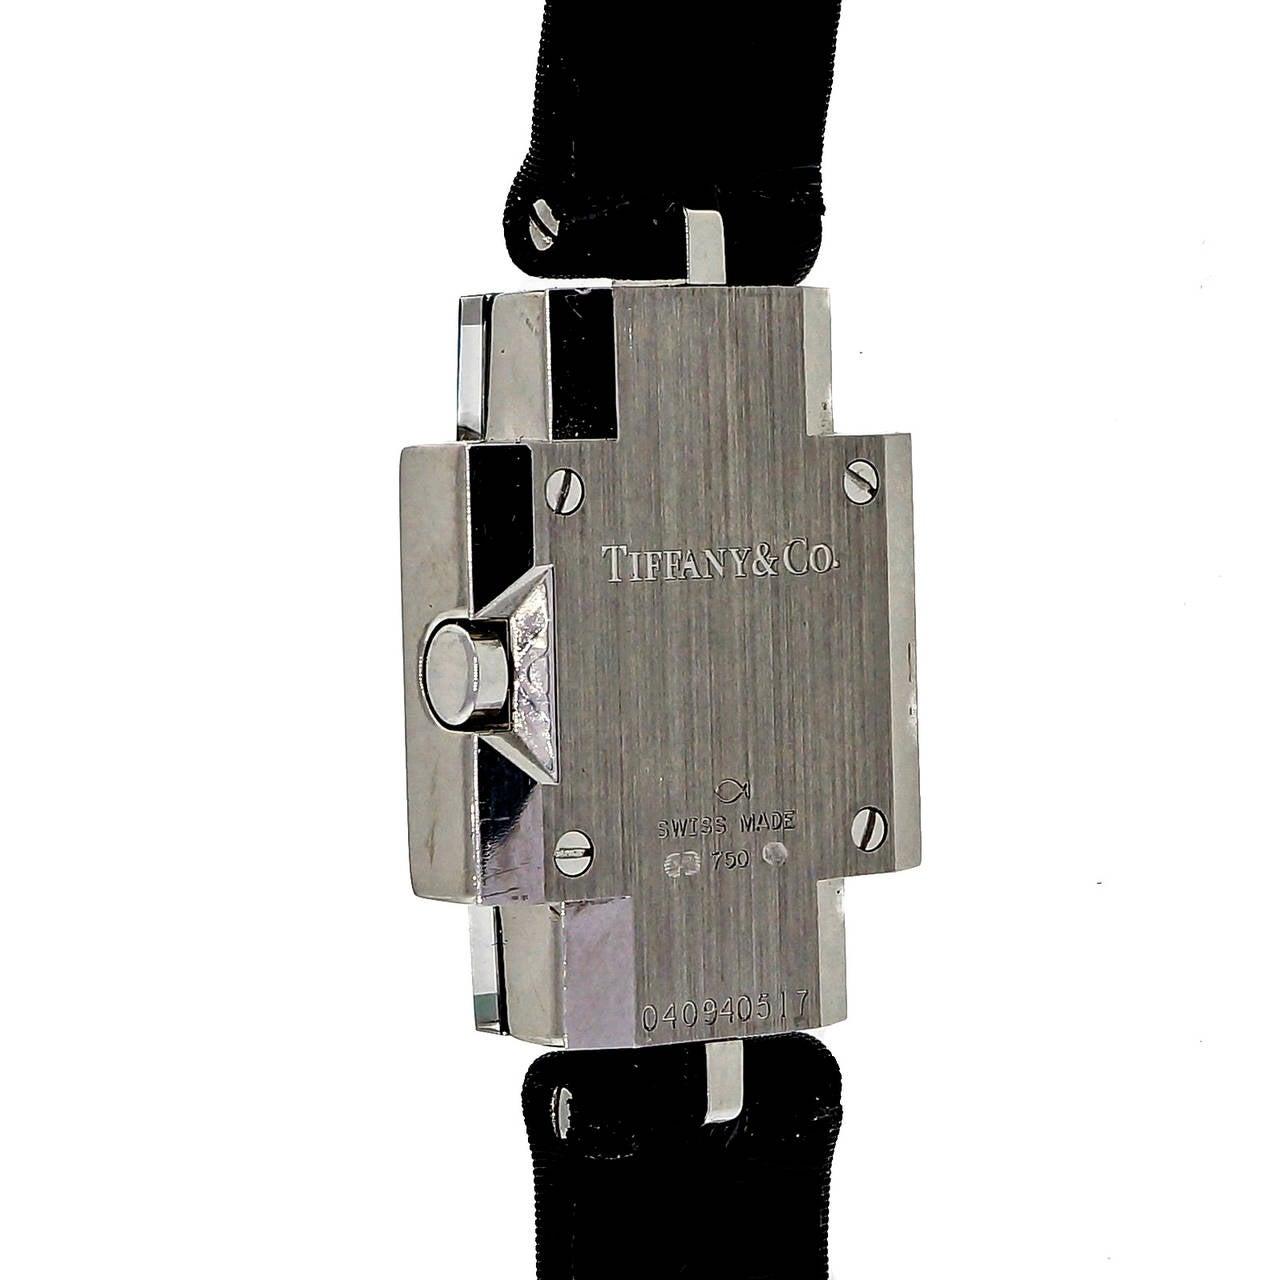 Tiffany & Co Lady's White Gold and Diamond Wristwatch 4